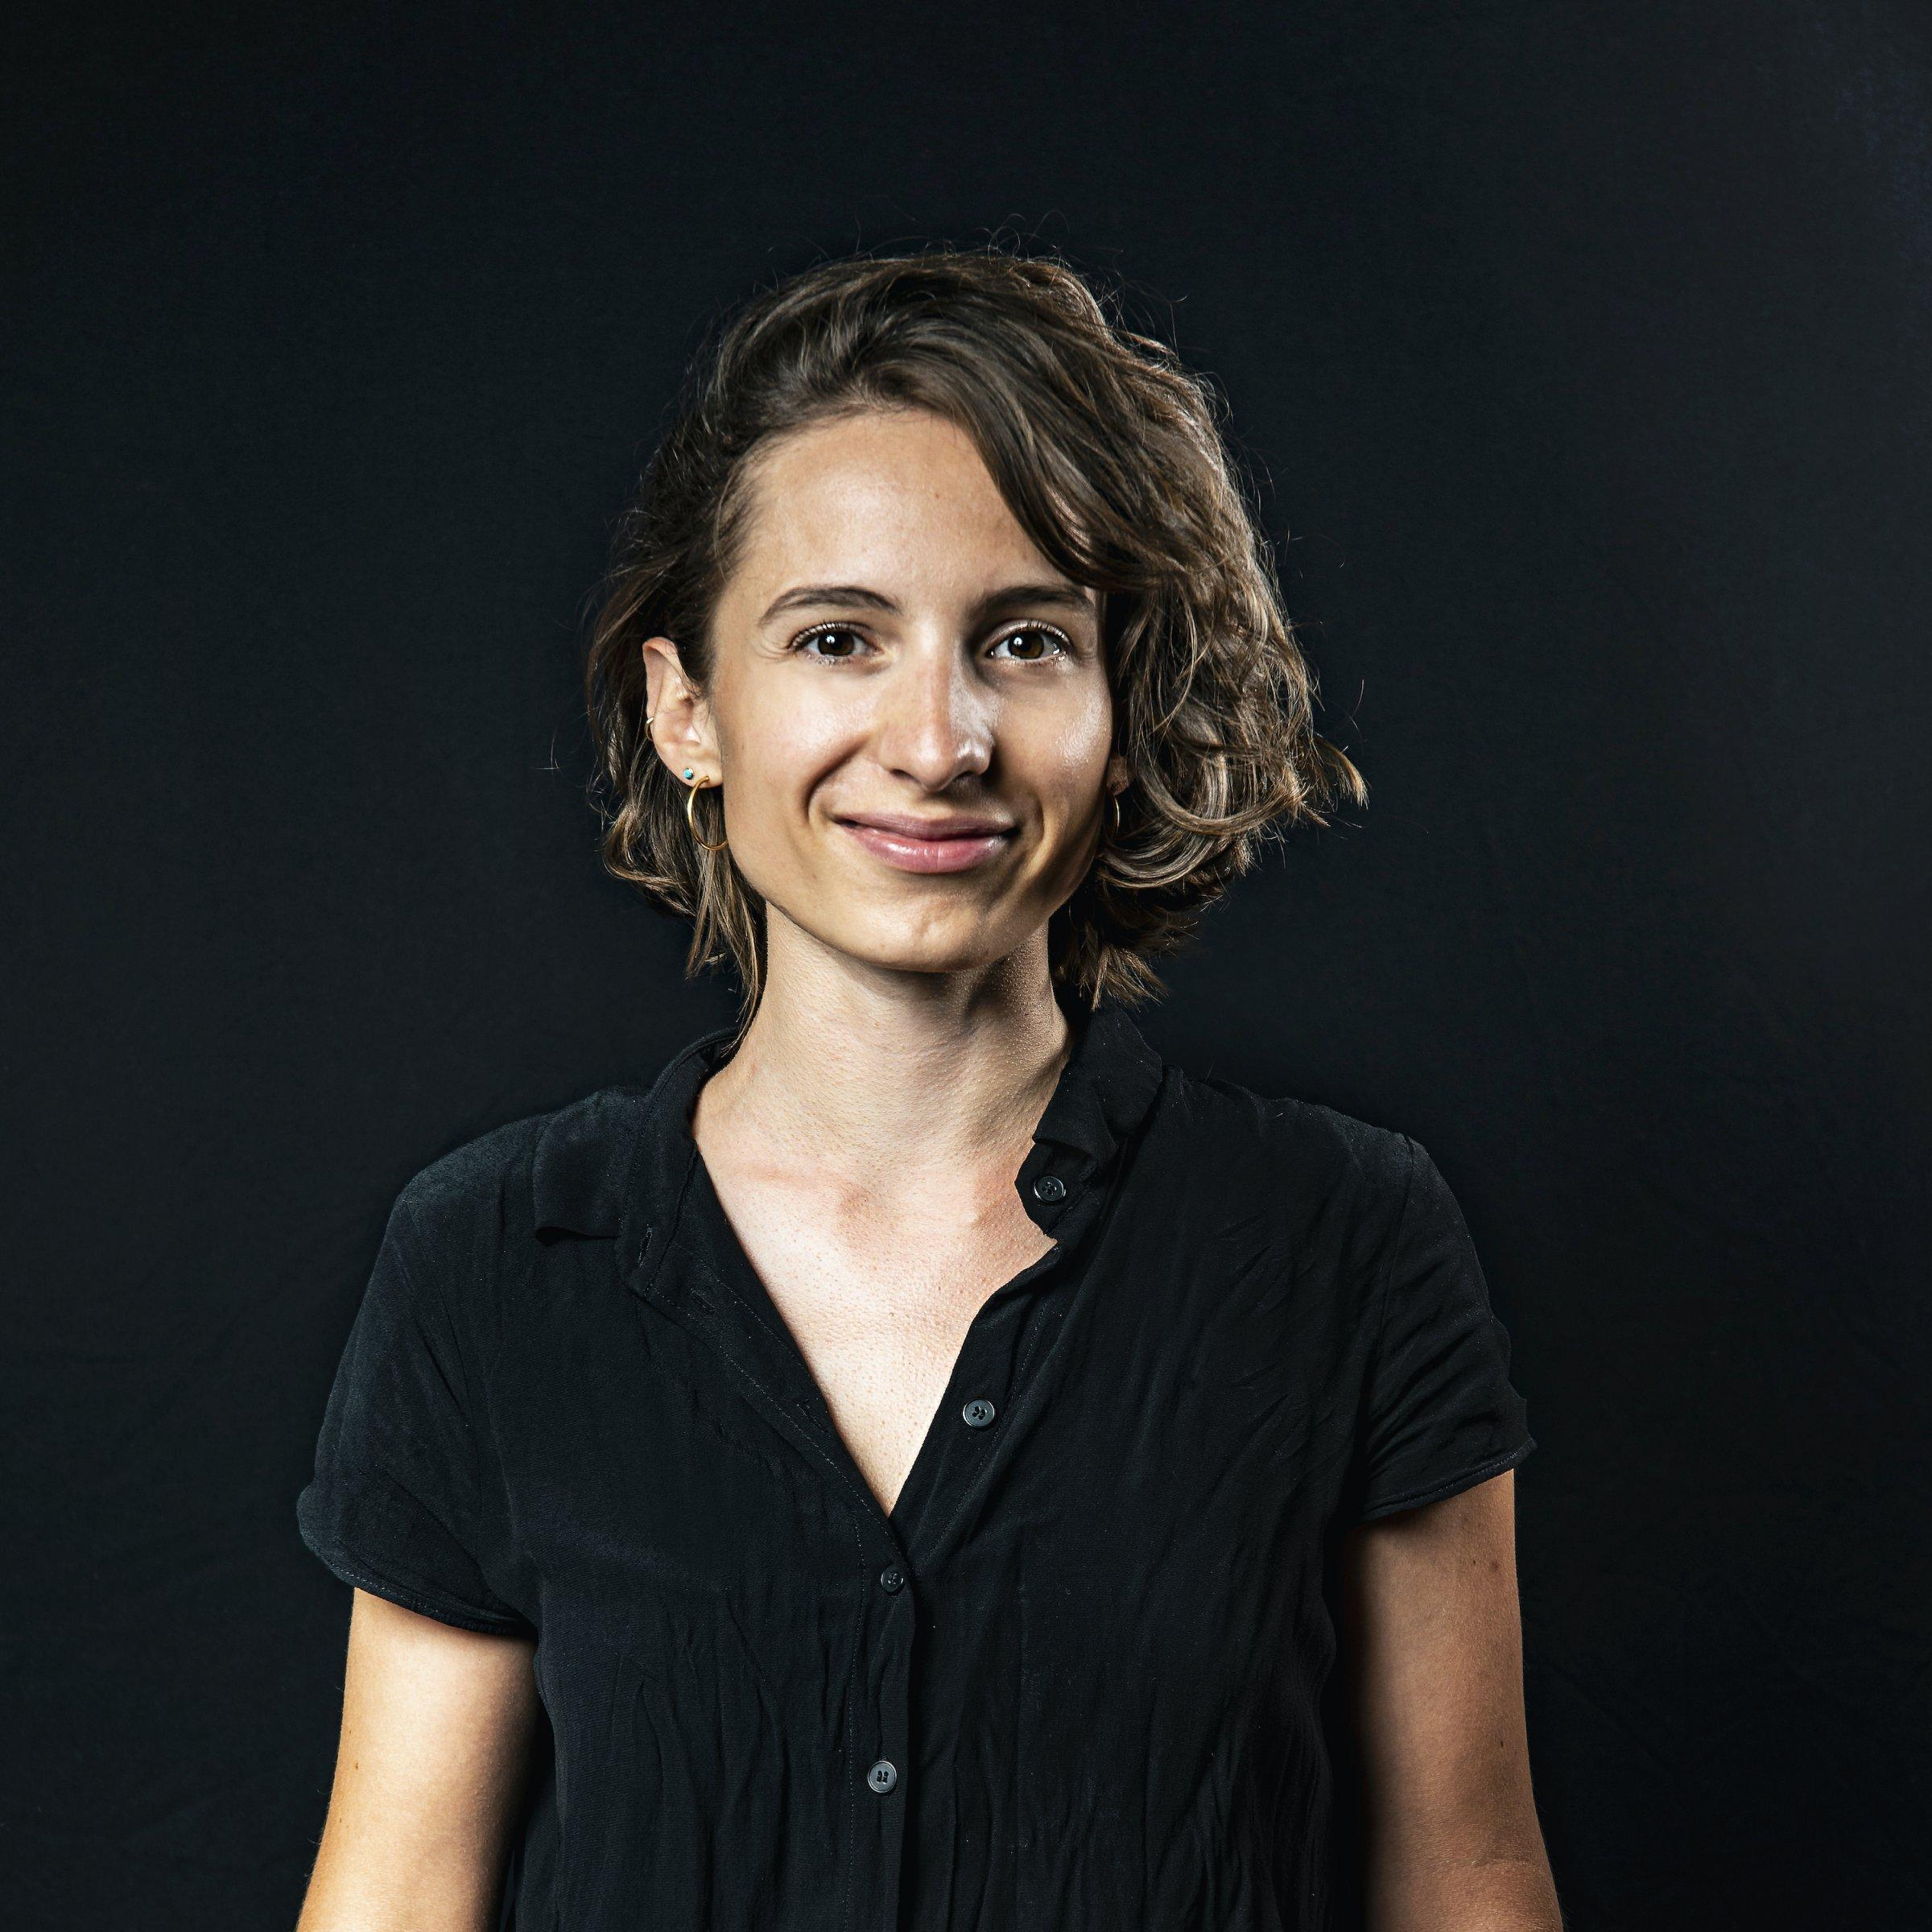 Katharina Kropshofer